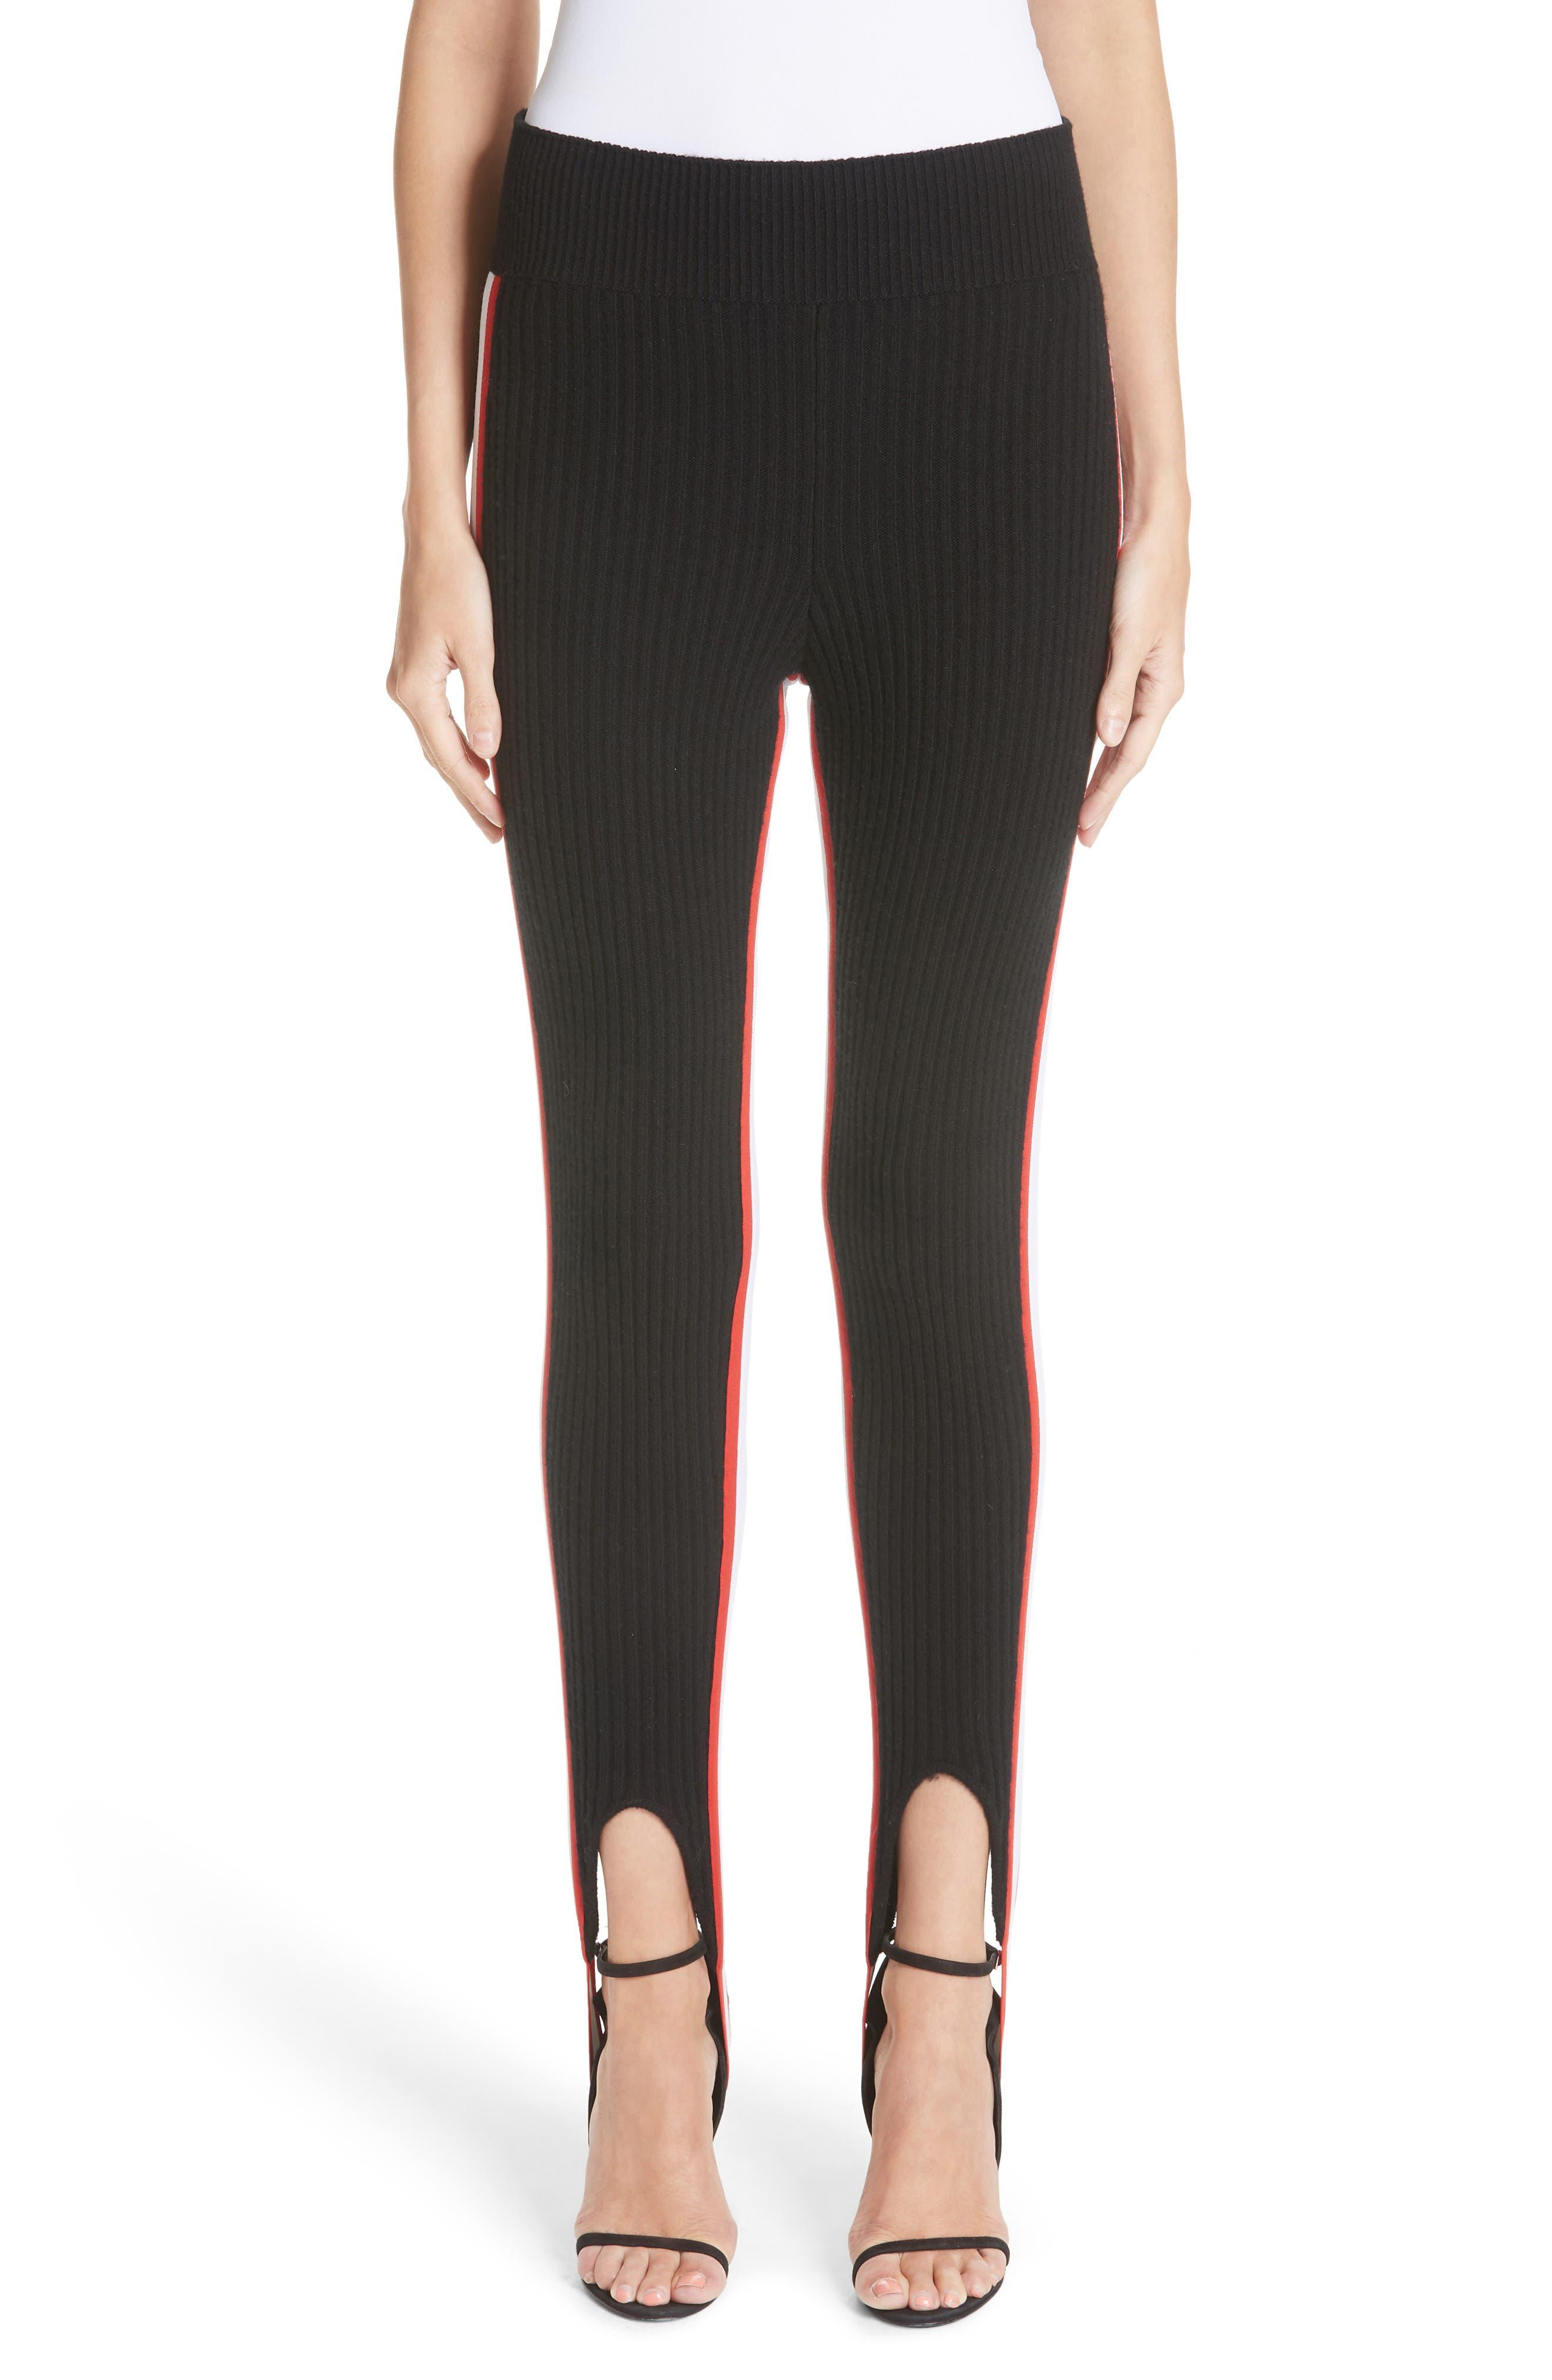 CALVIN KLEIN 205W39NYC Side Stripe Stretch Wool Stirrup Leggings, Main, color, 001